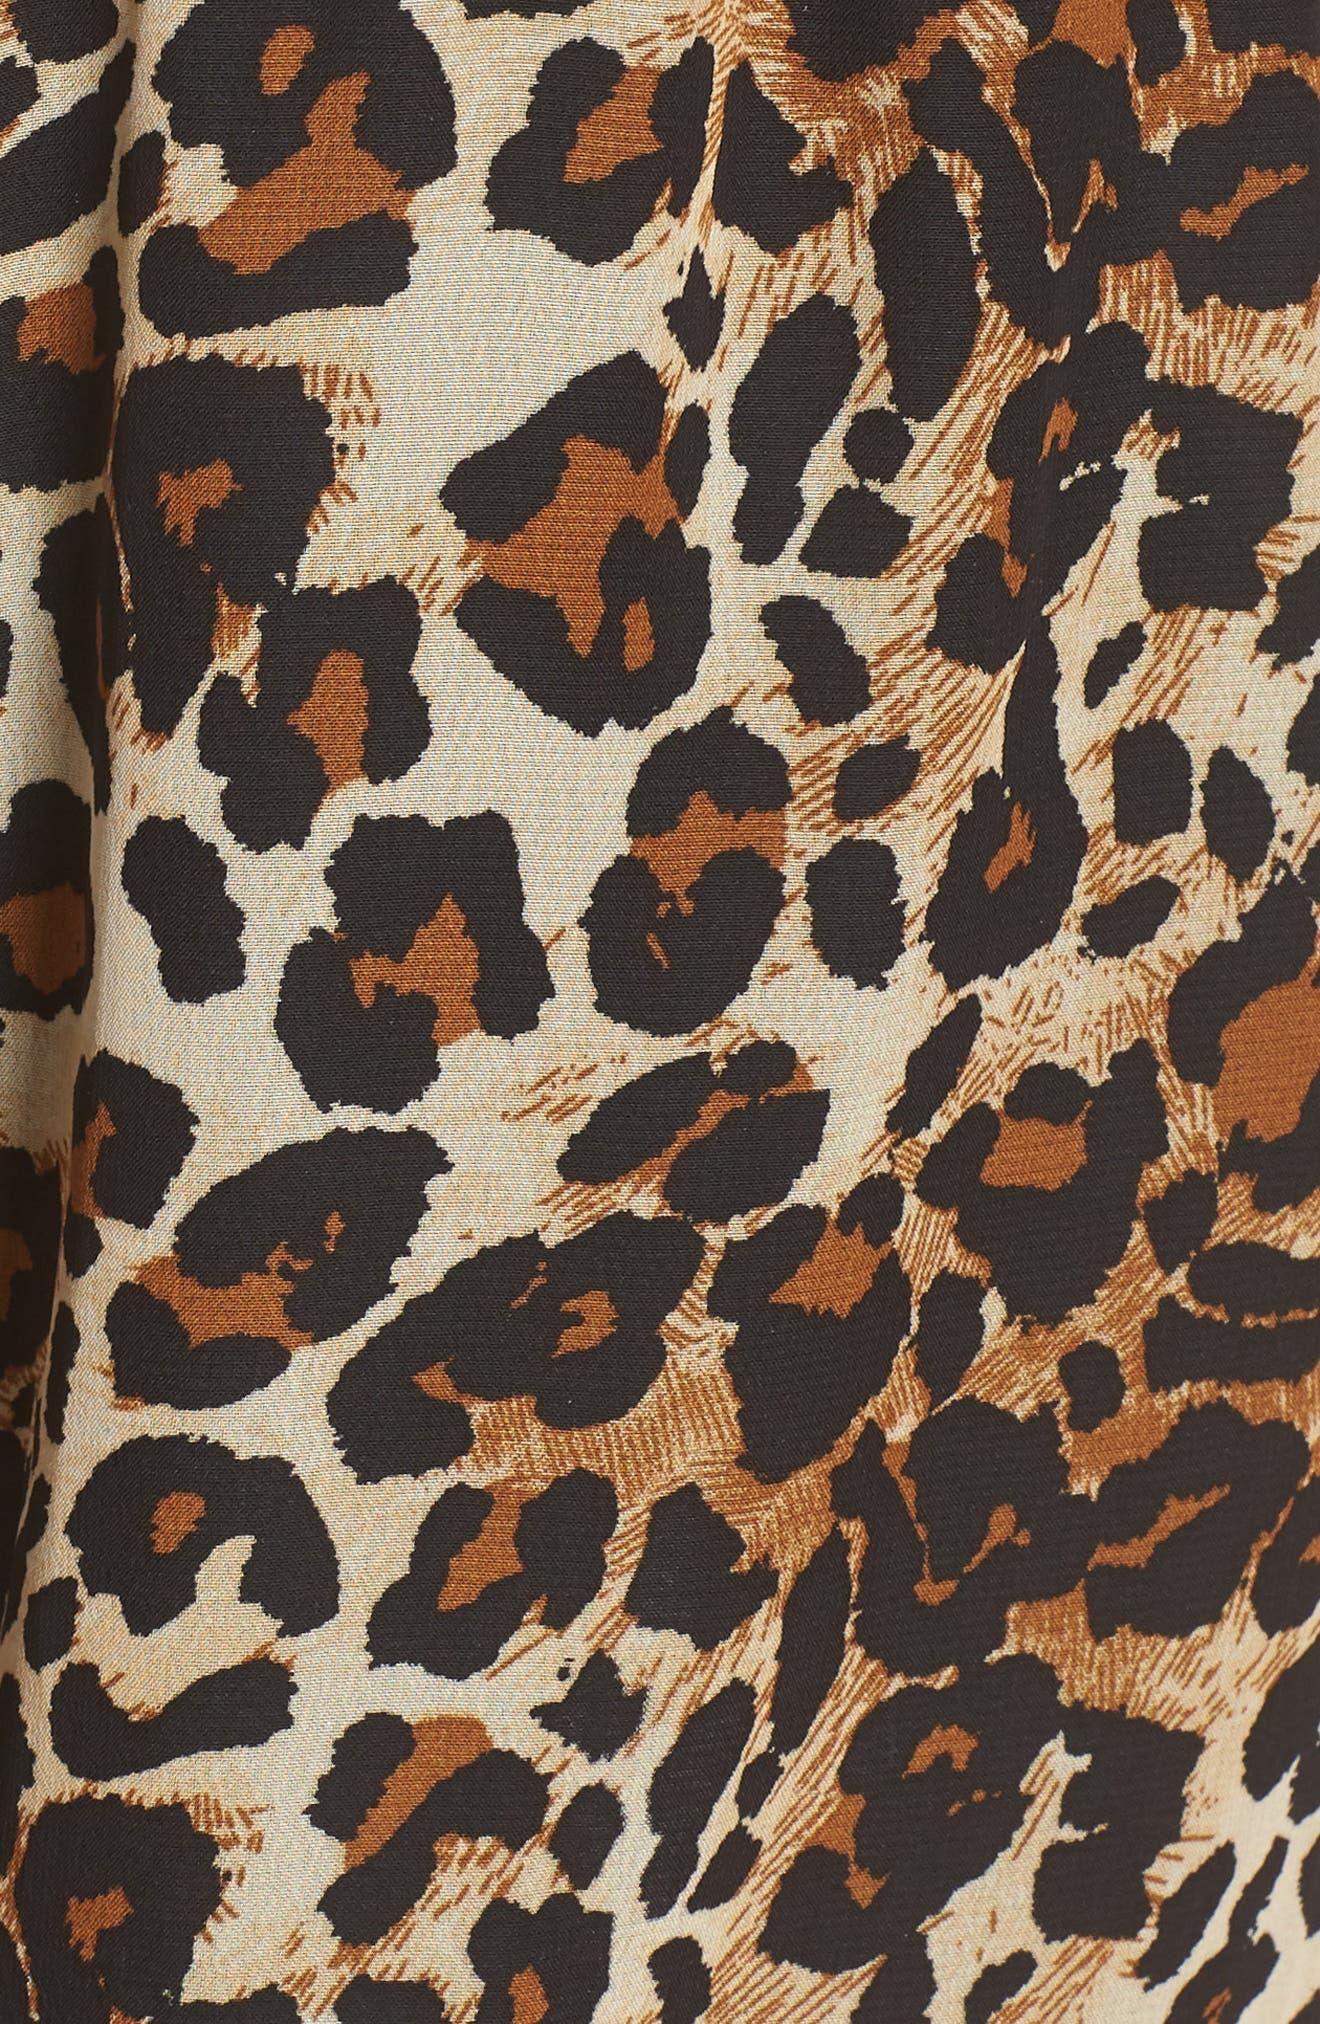 Leopard Print Halter Romper,                             Alternate thumbnail 6, color,                             EXPLODED CHEETAH